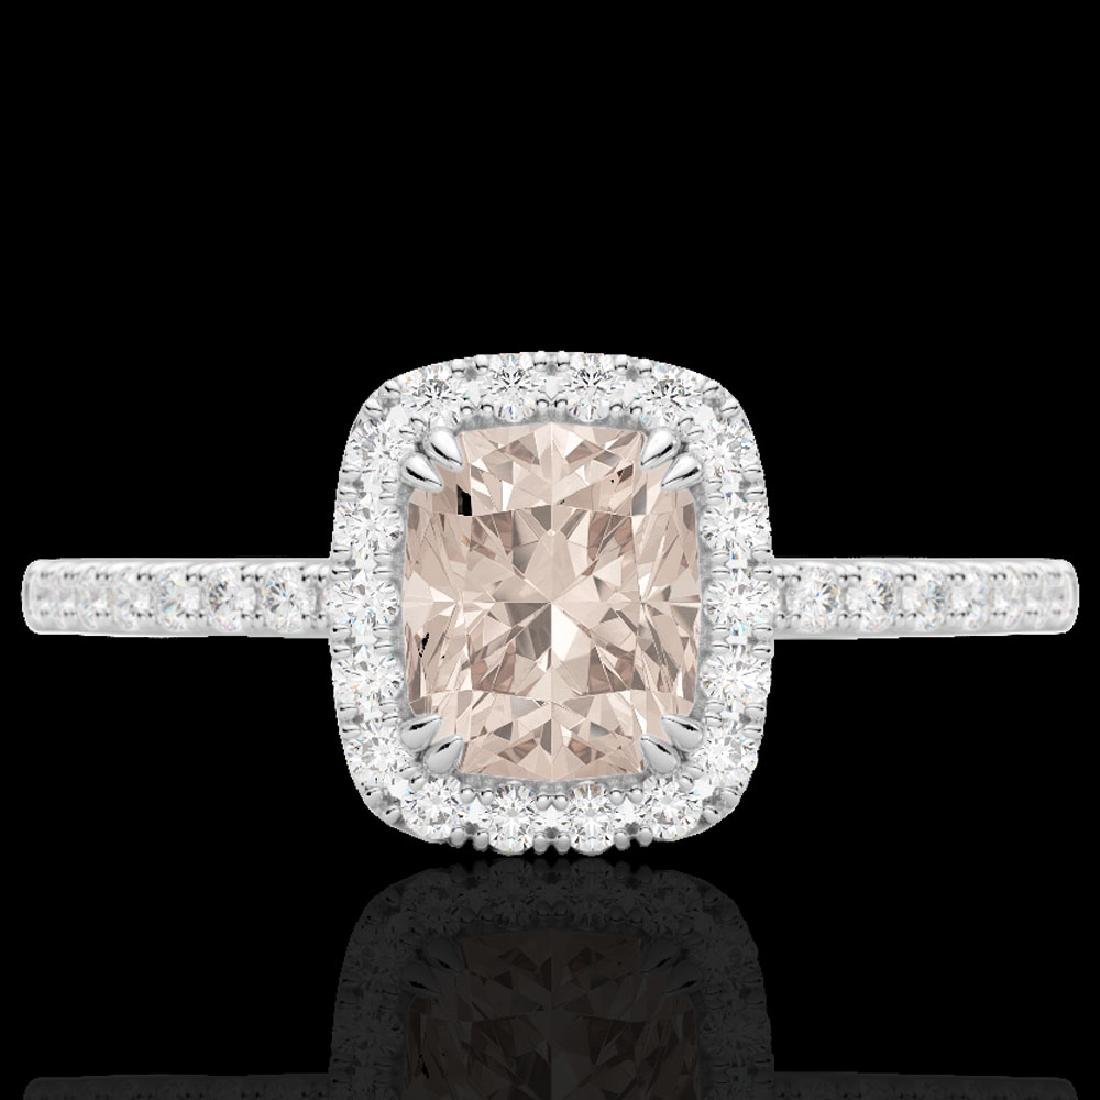 1.25 CTW Morganite & Micro Pave VS/SI Diamond Halo Ring